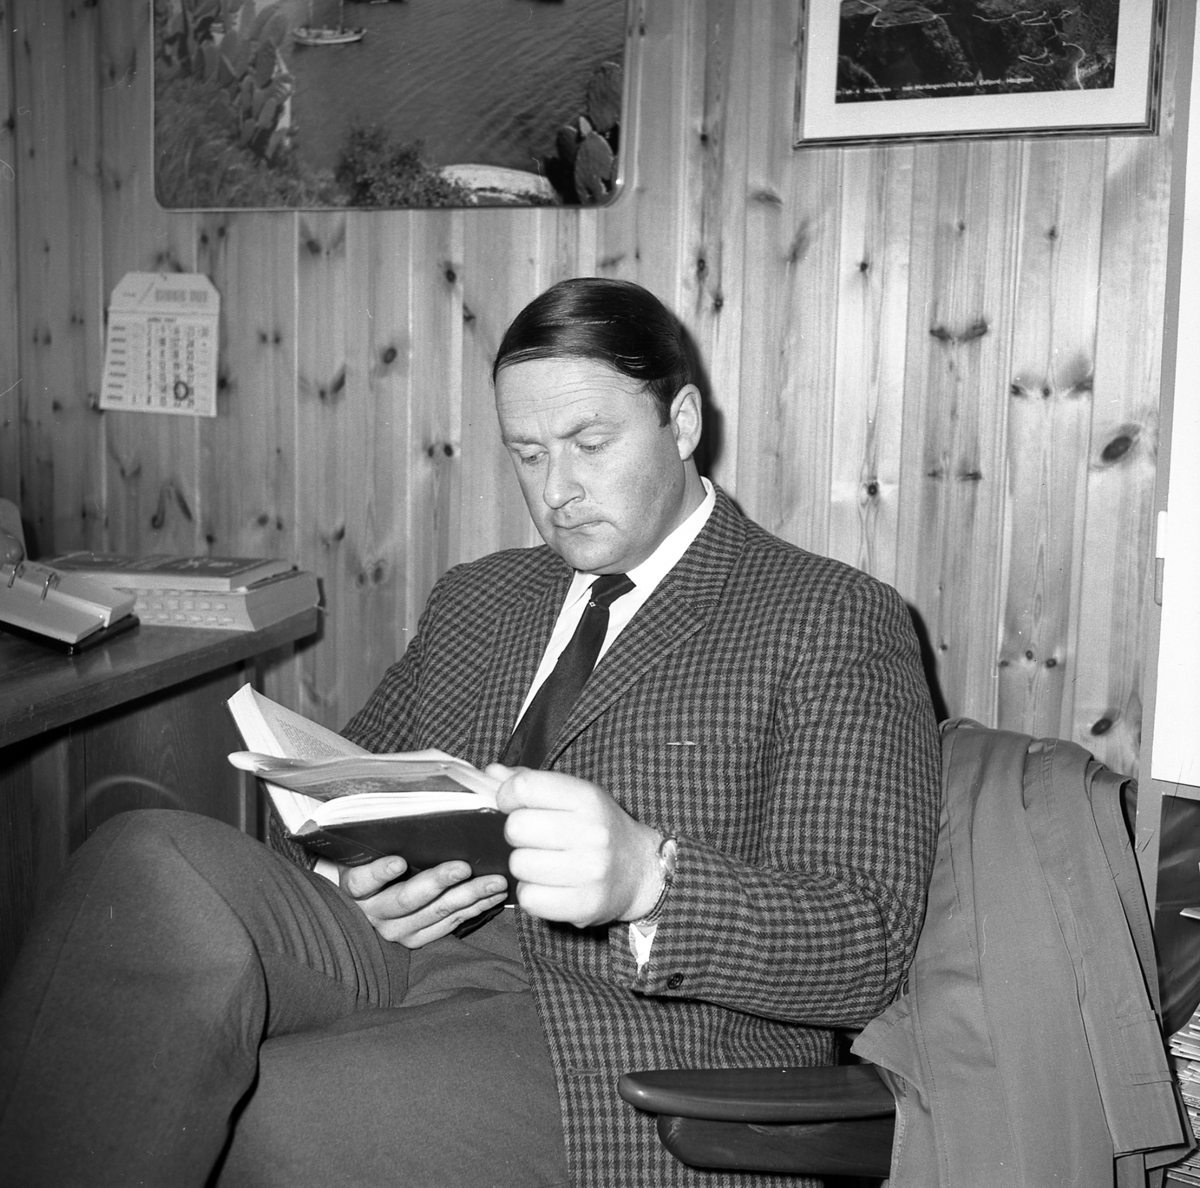 Olav Sæter